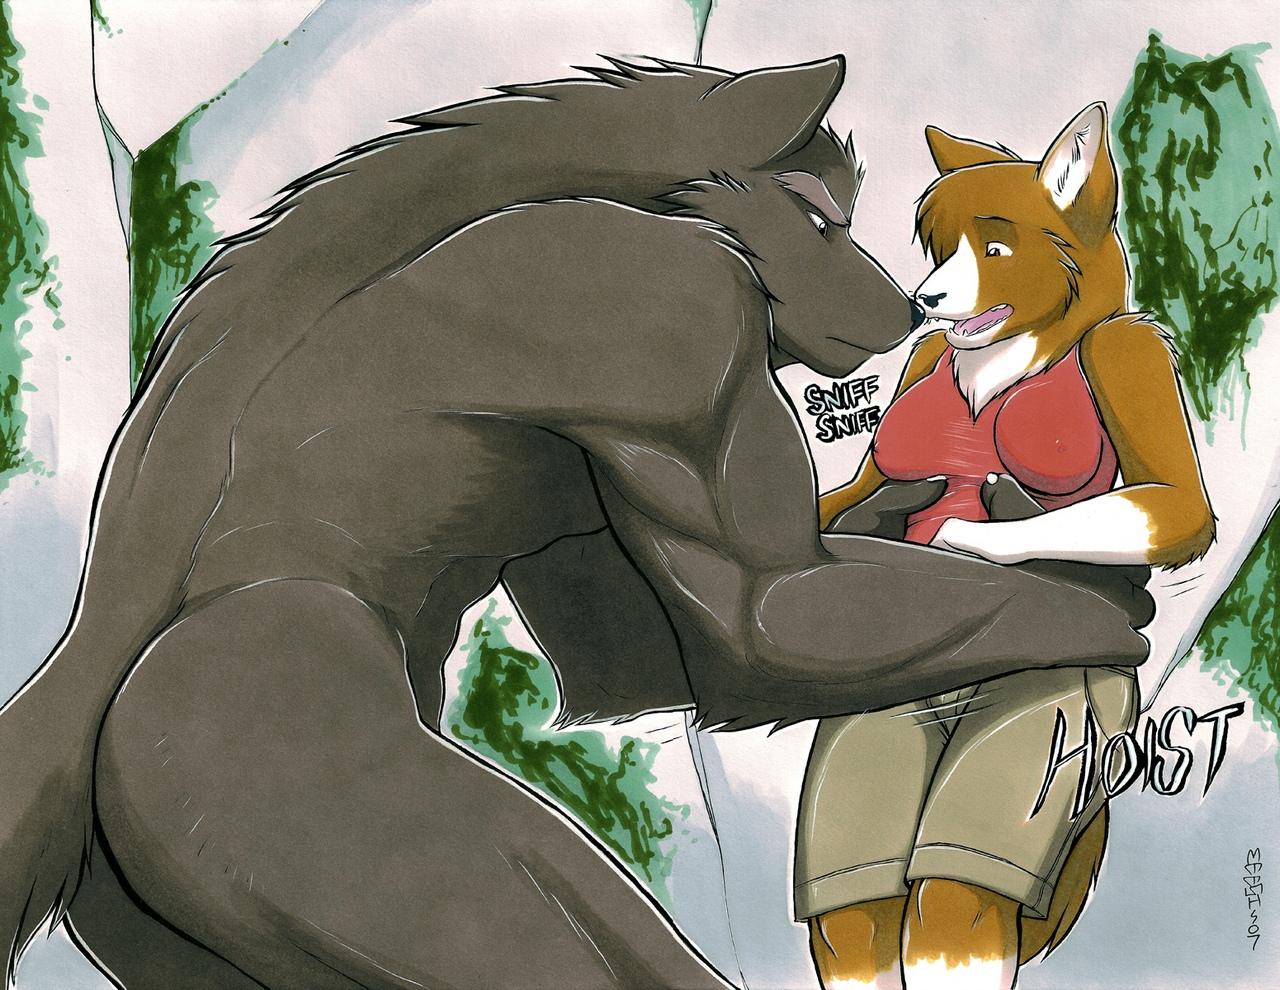 The Werewolf And The Corgi